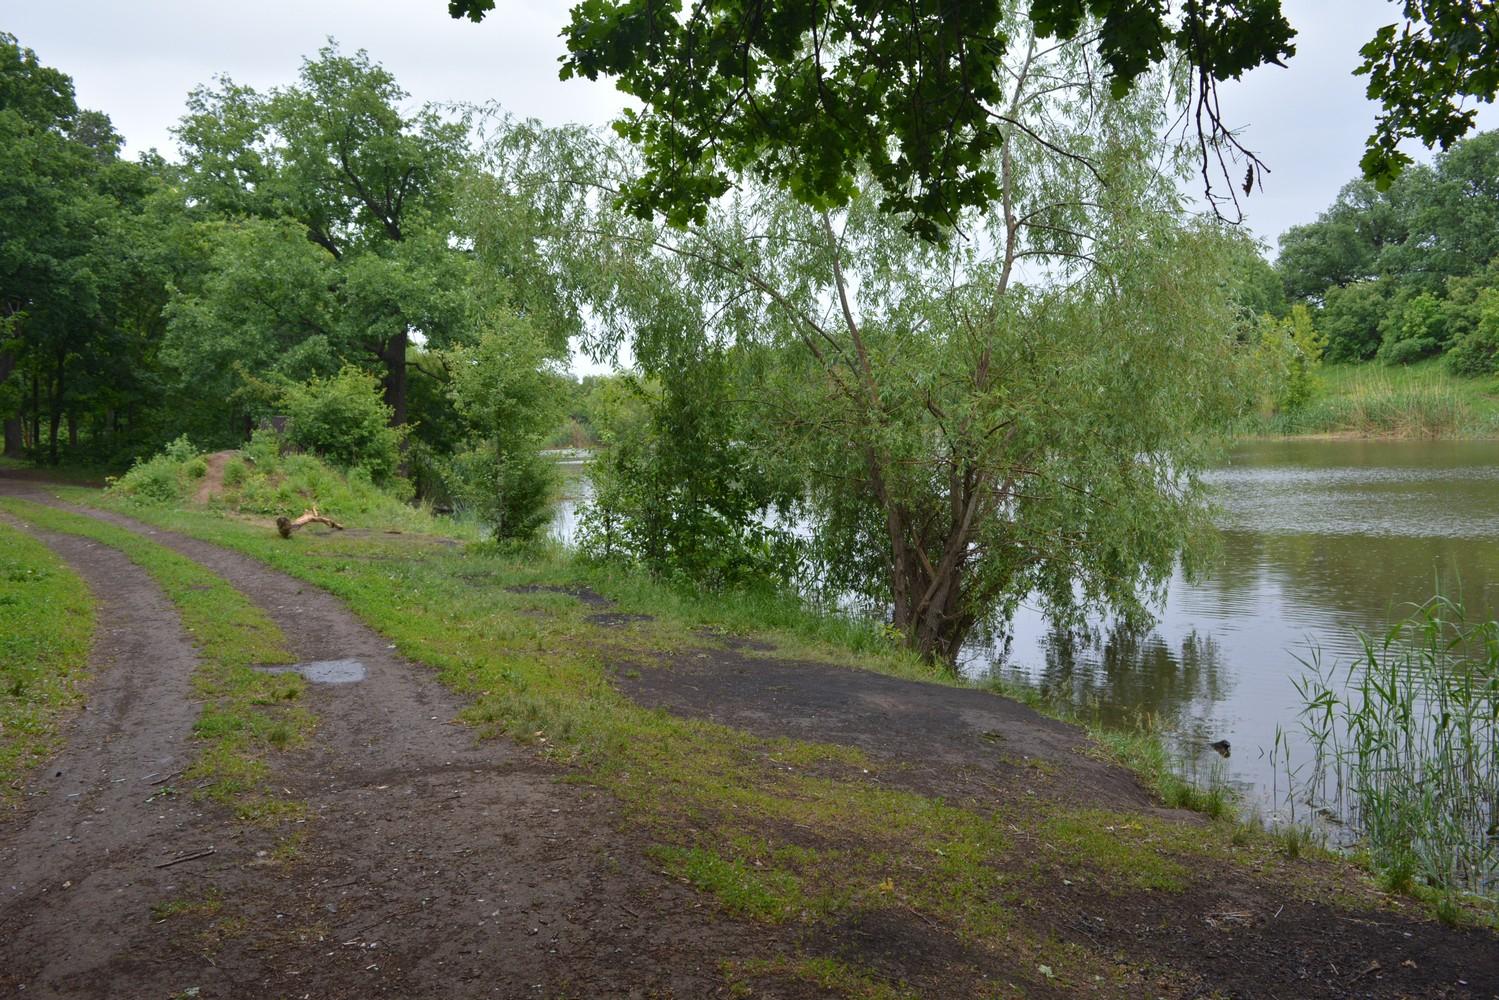 Пруд Семхоз адаптируют для рыбалки в Саратове. 15692.jpeg